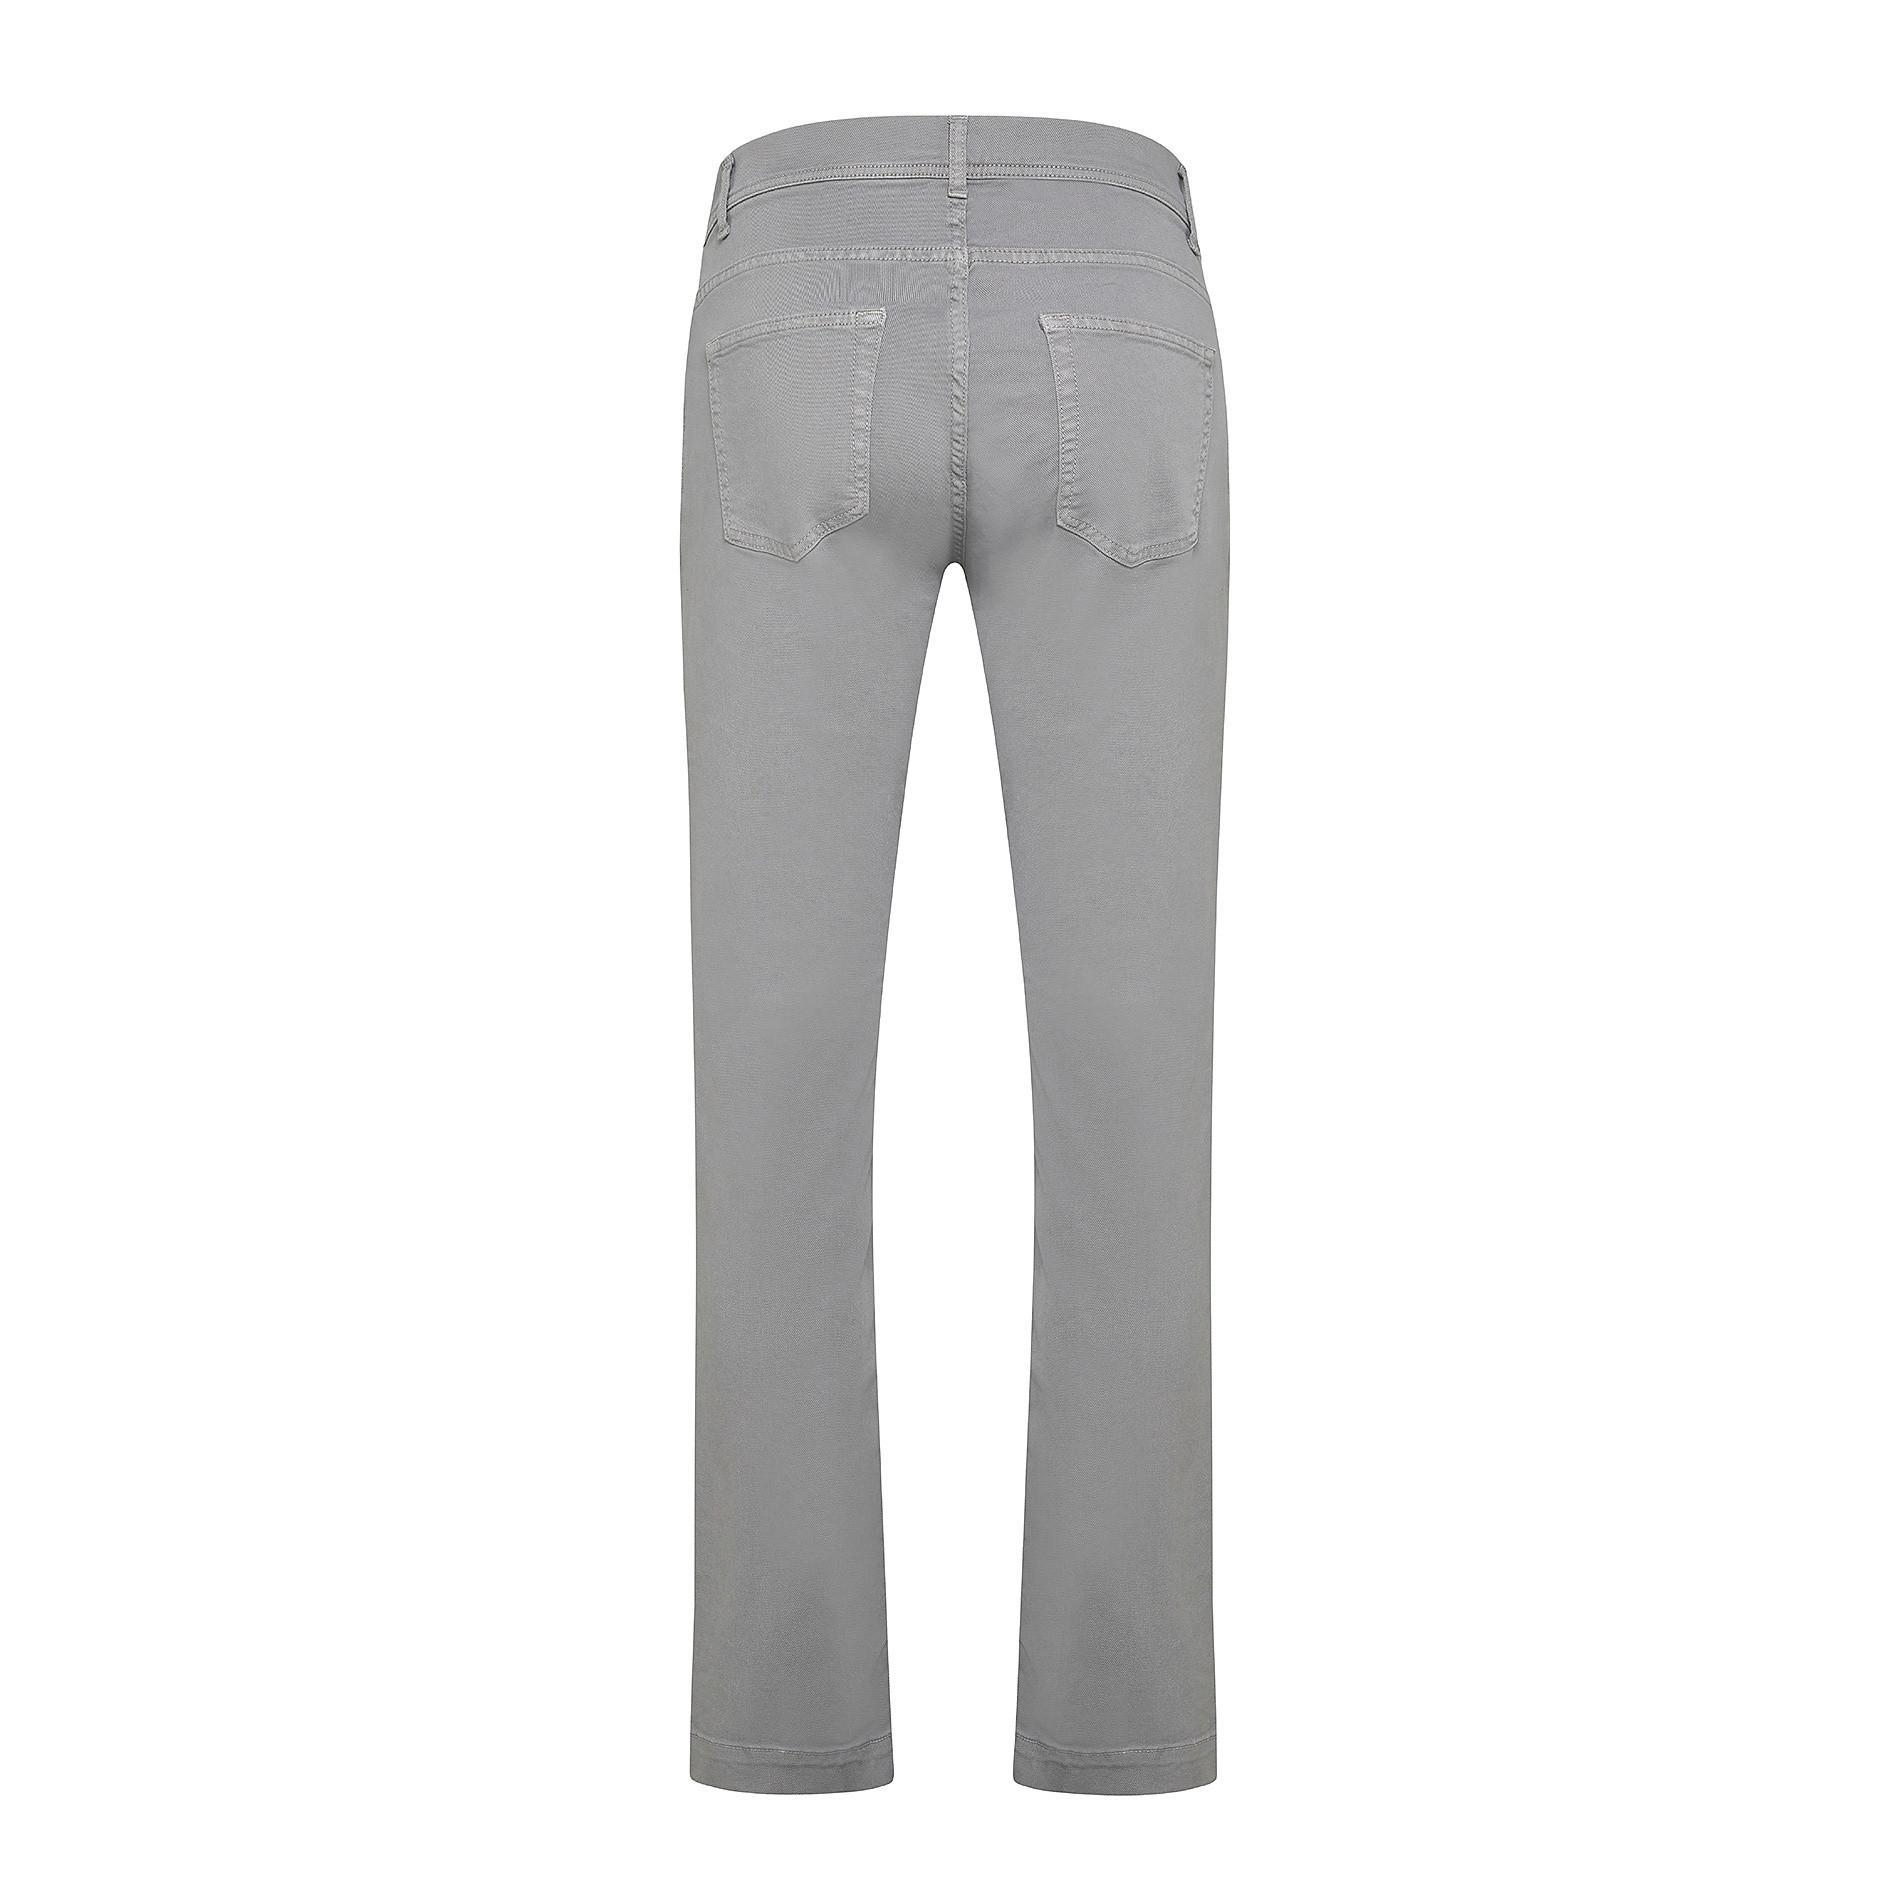 Pantalone cotone stretch 5 tasche JCT, Grigio chiaro, large image number 1